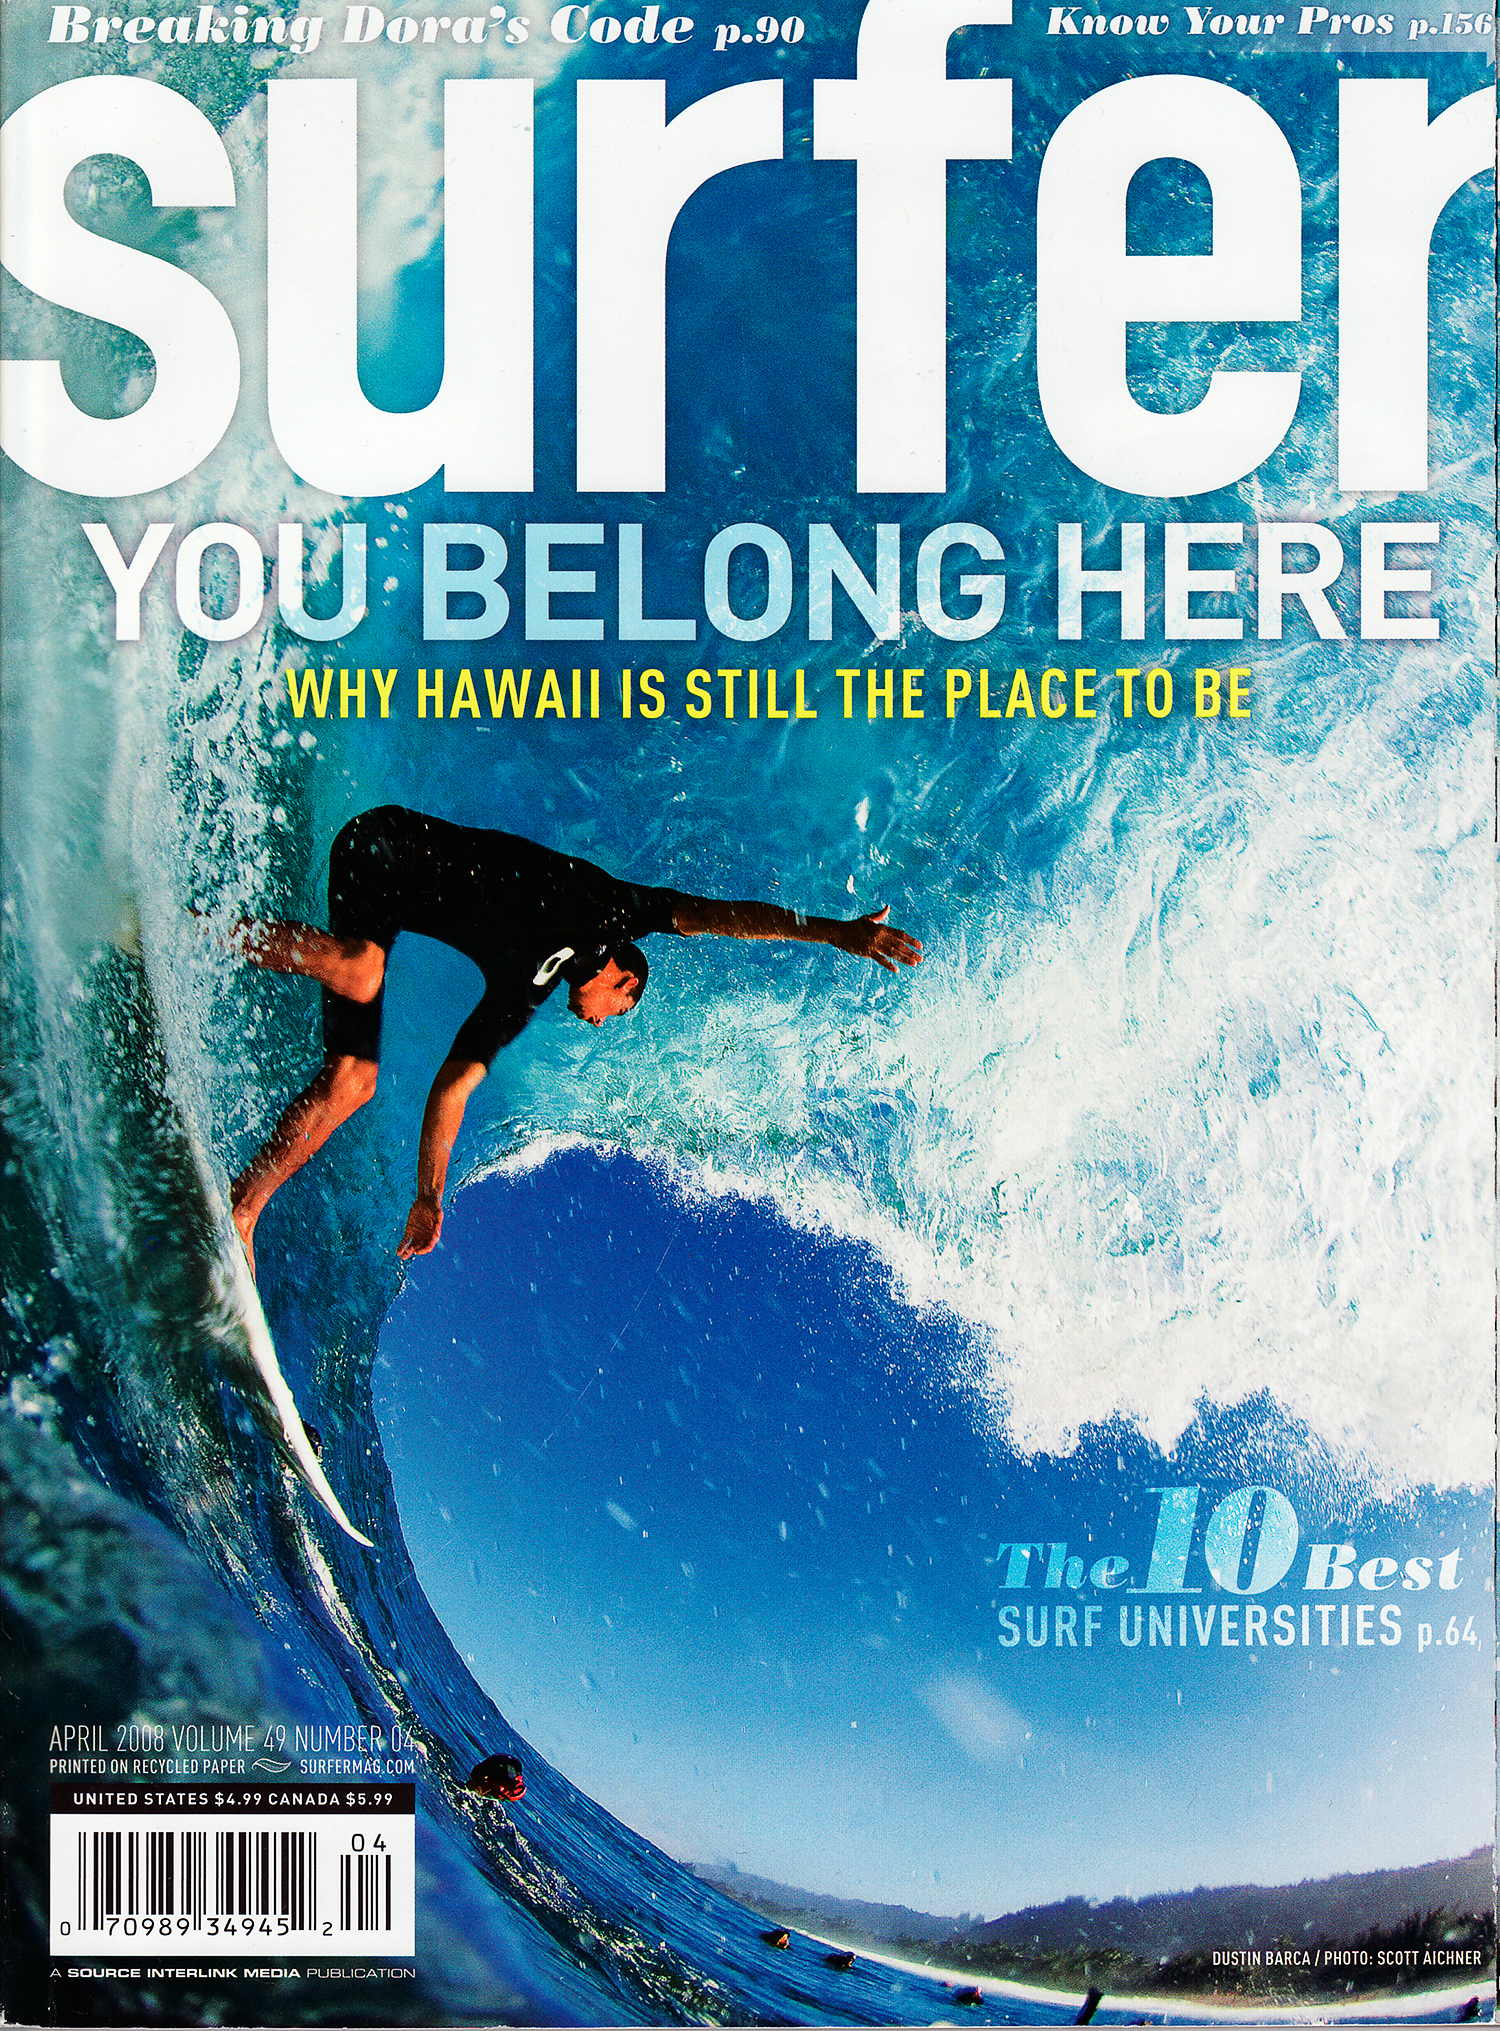 2008-04_Surfer-Cover_A4-300dpi.jpg